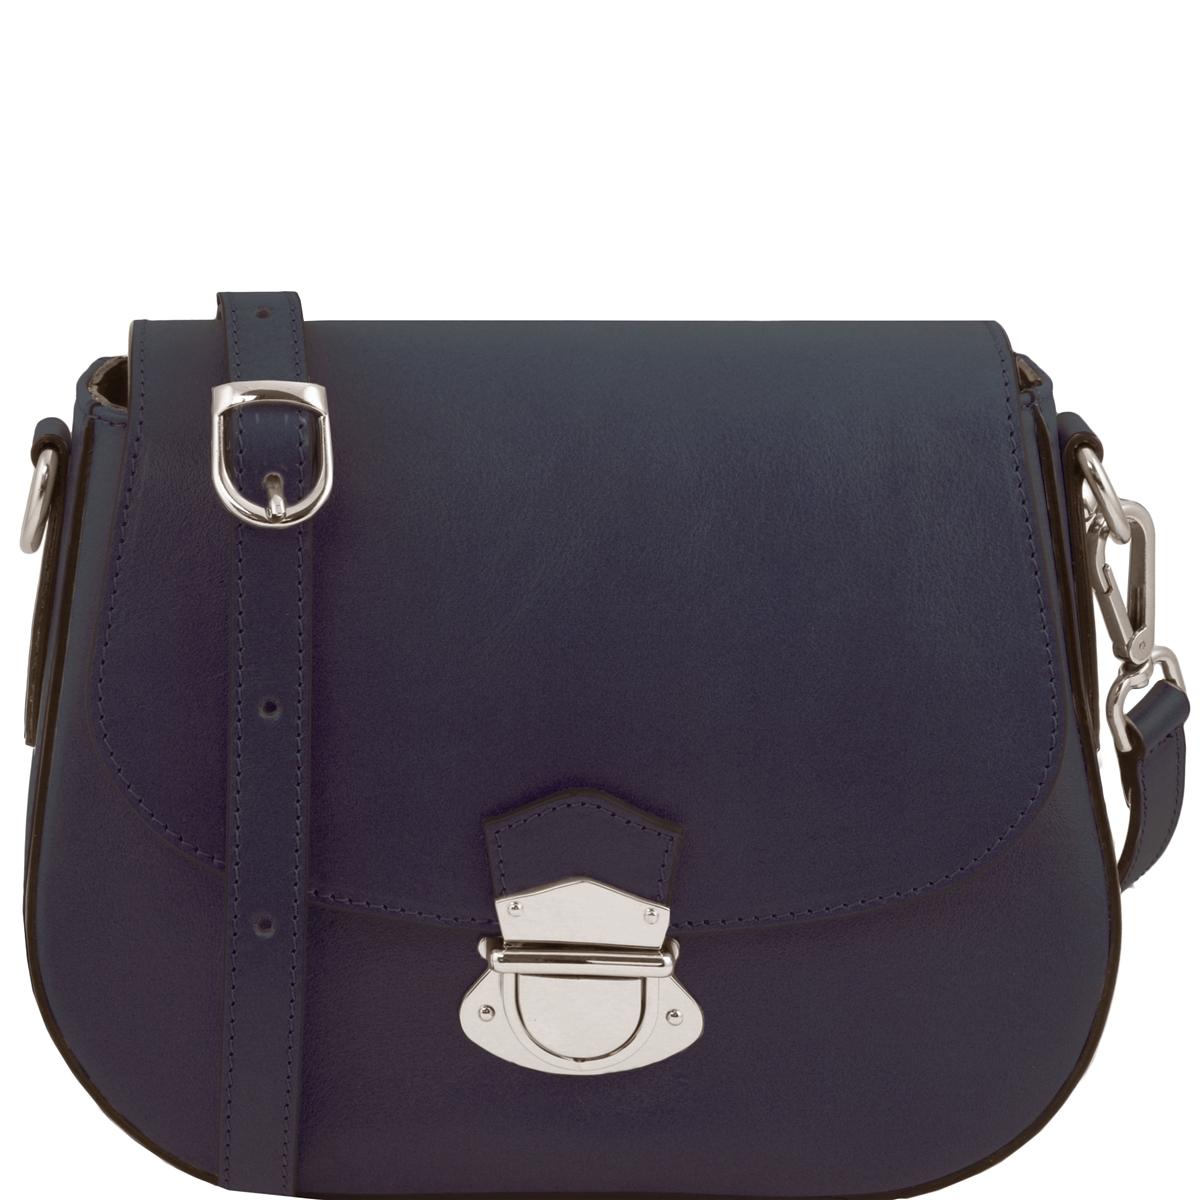 99fa53a57a Tuscany Leather TL141517 Neoclassic Shoulder Bag- Dark Blue